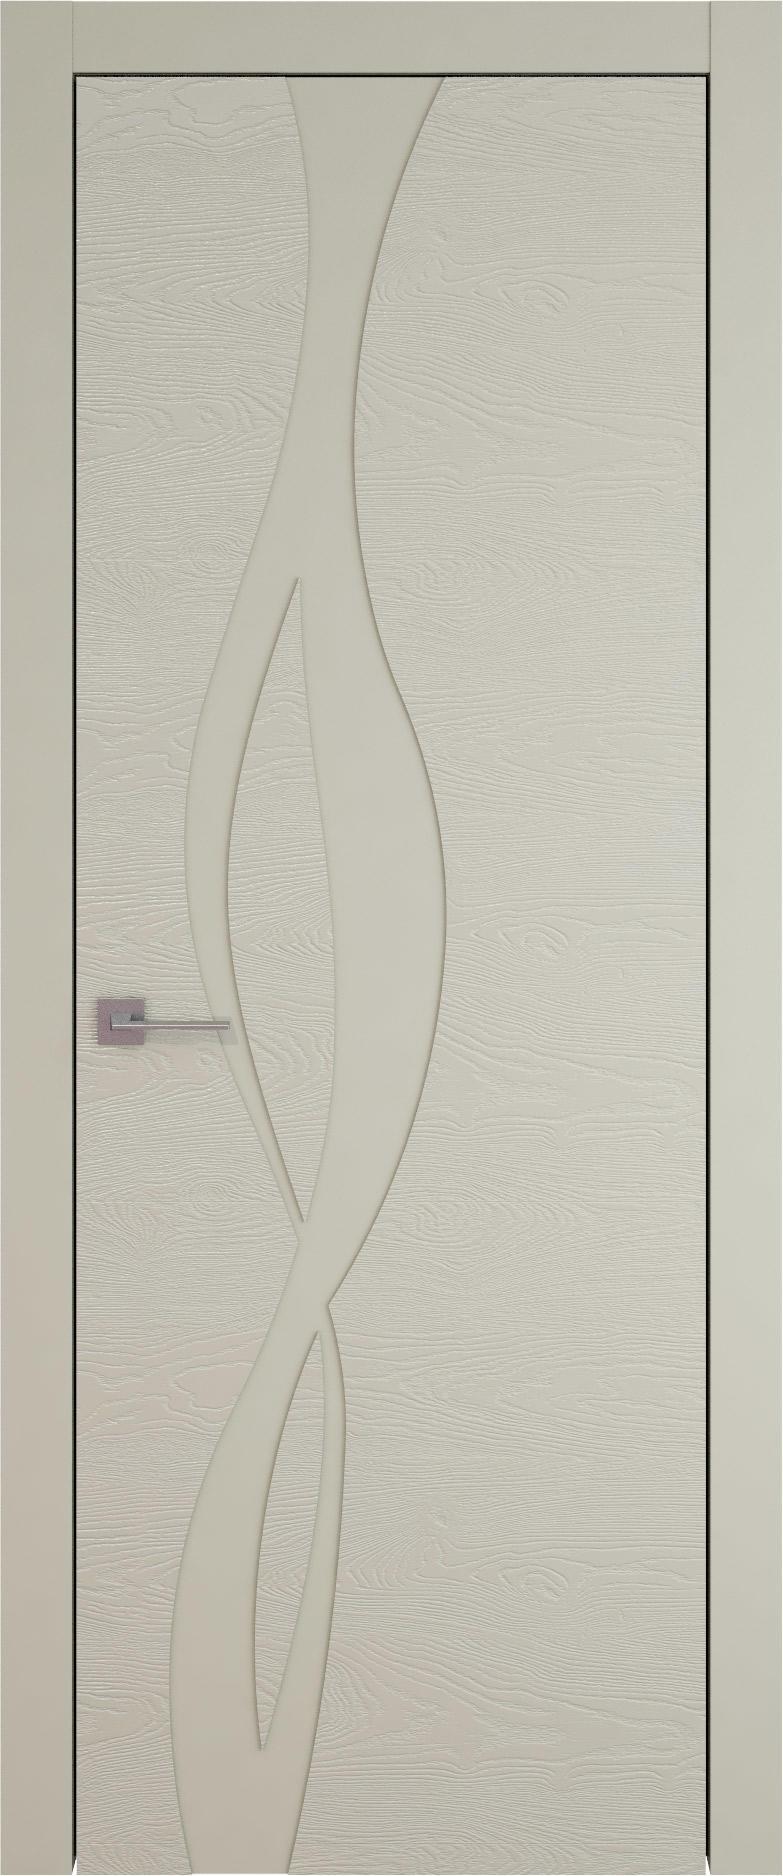 Tivoli Г-5 цвет - Серо-оливковая эмаль по шпону (RAL 7032) Без стекла (ДГ)